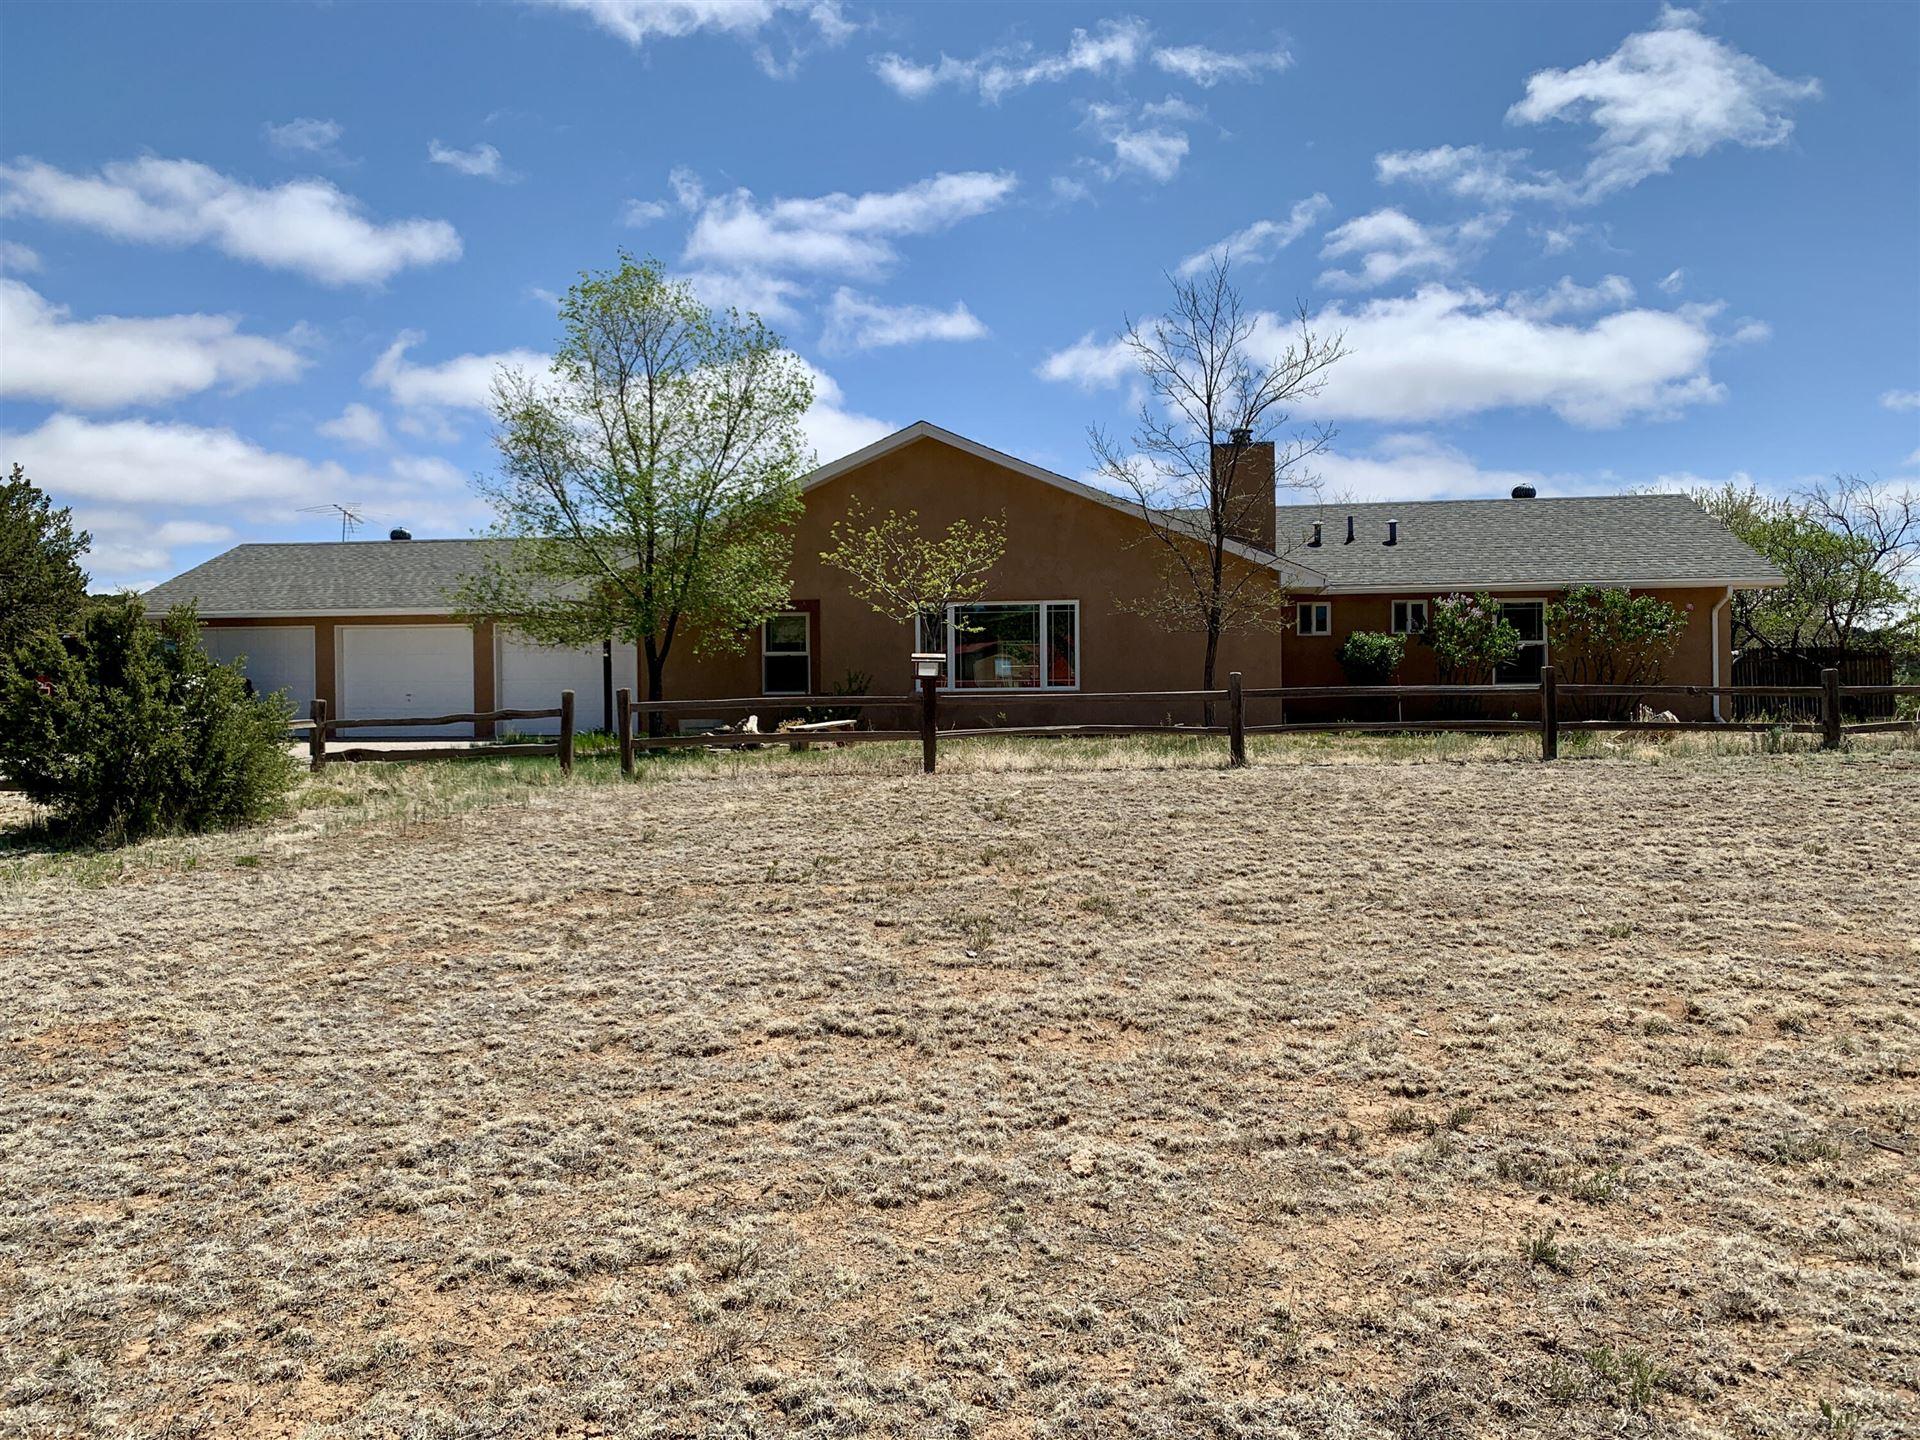 14 Crestview Road, Edgewood, NM 87015 - #: 991484